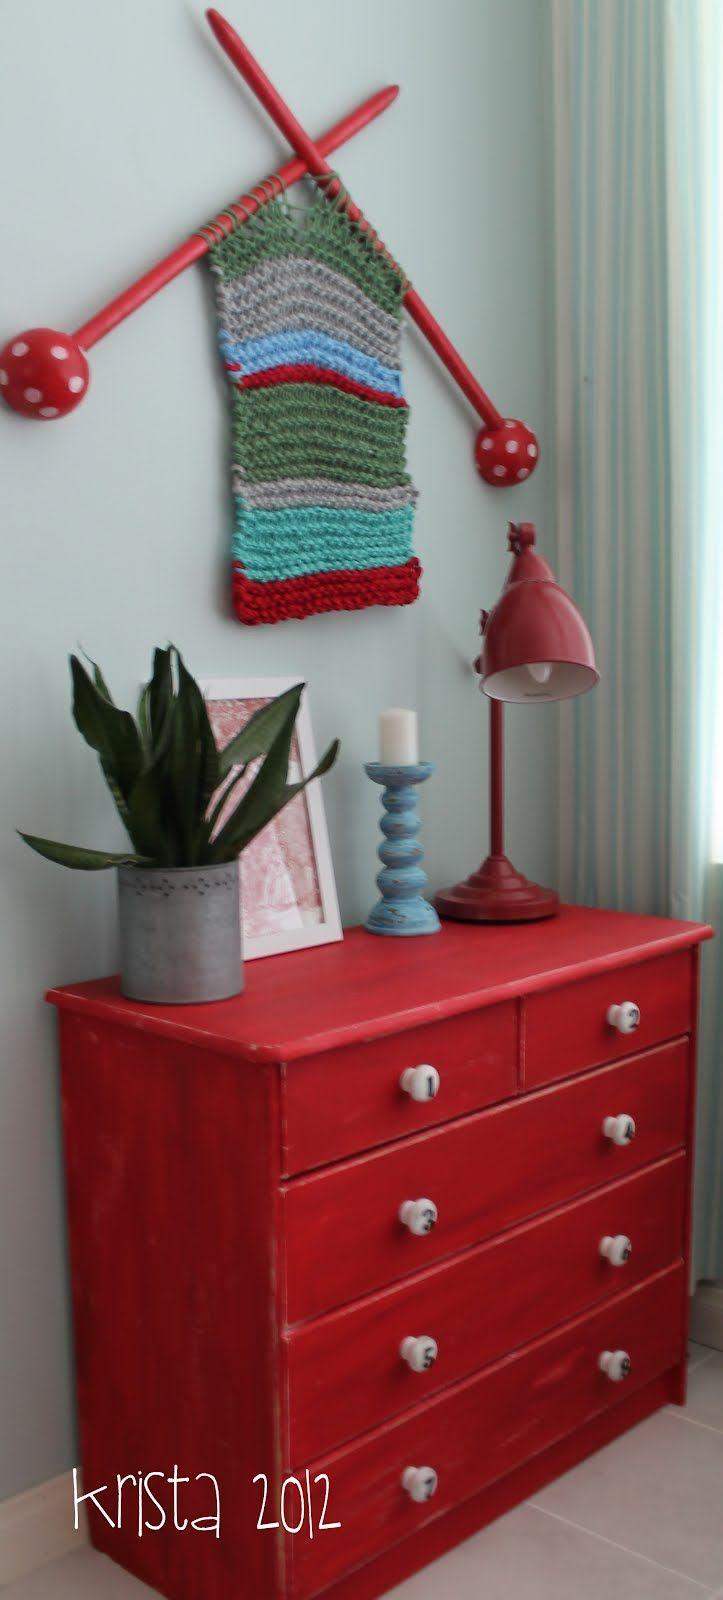 Knit wall art!